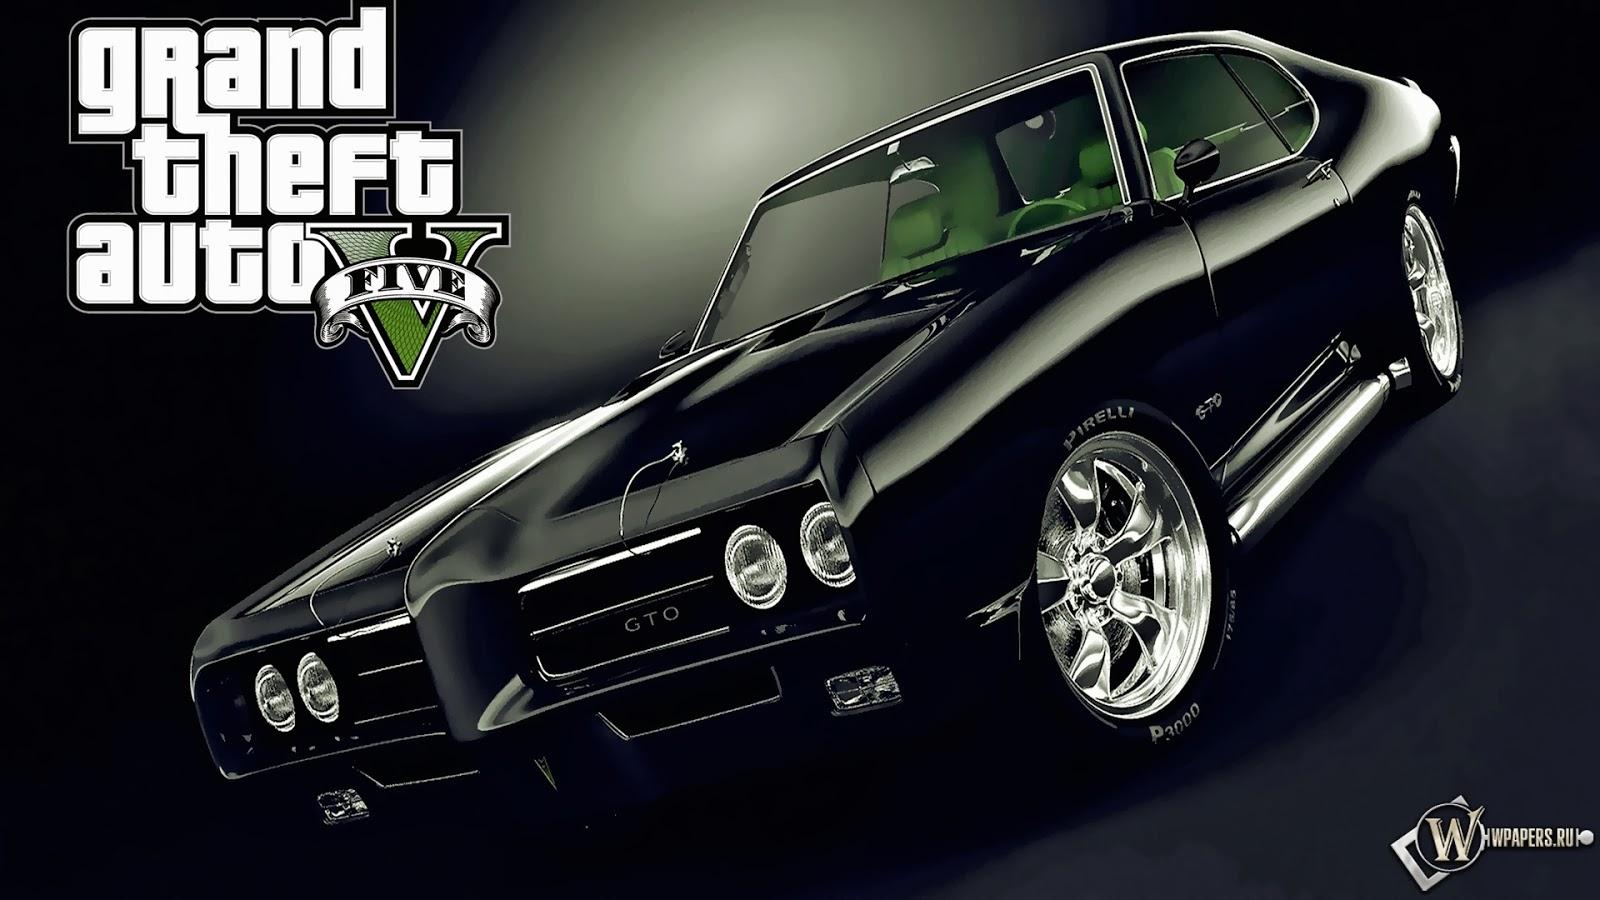 Cars Grand Theft Auto GTA V Wallpaper HDjpg 1600x900